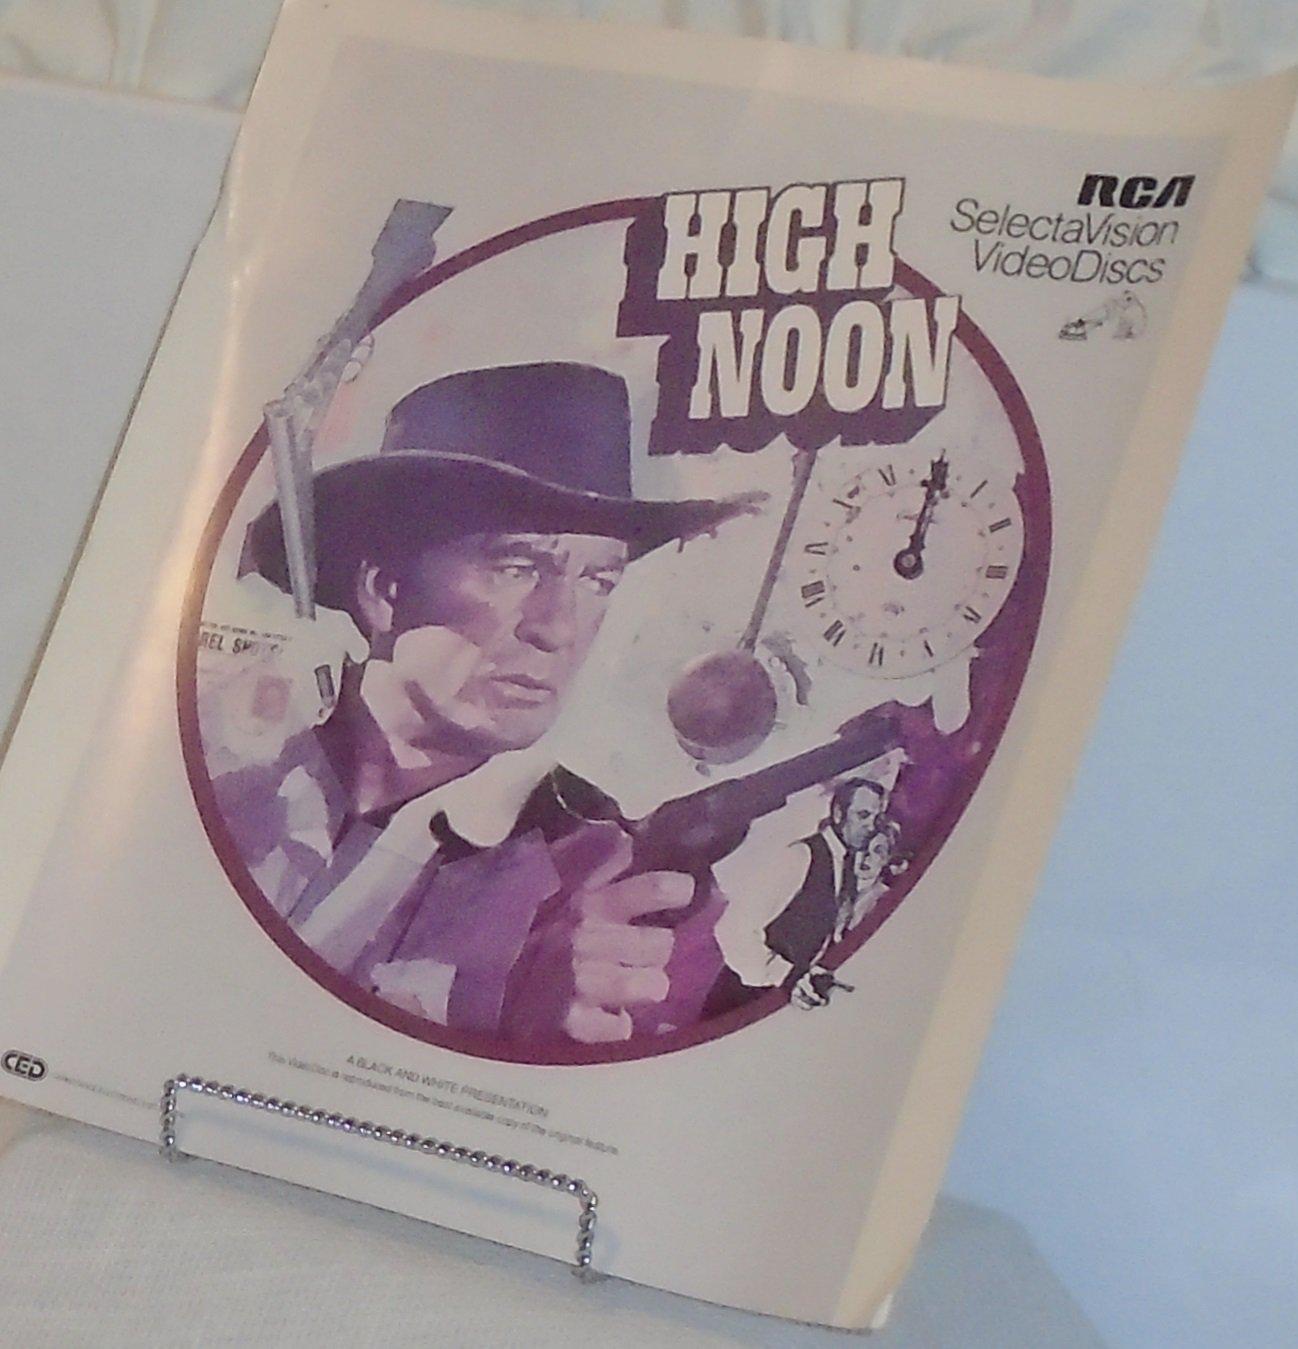 Vintage CED High Noon Western Classic Movie Videodisc RCA Selectavision